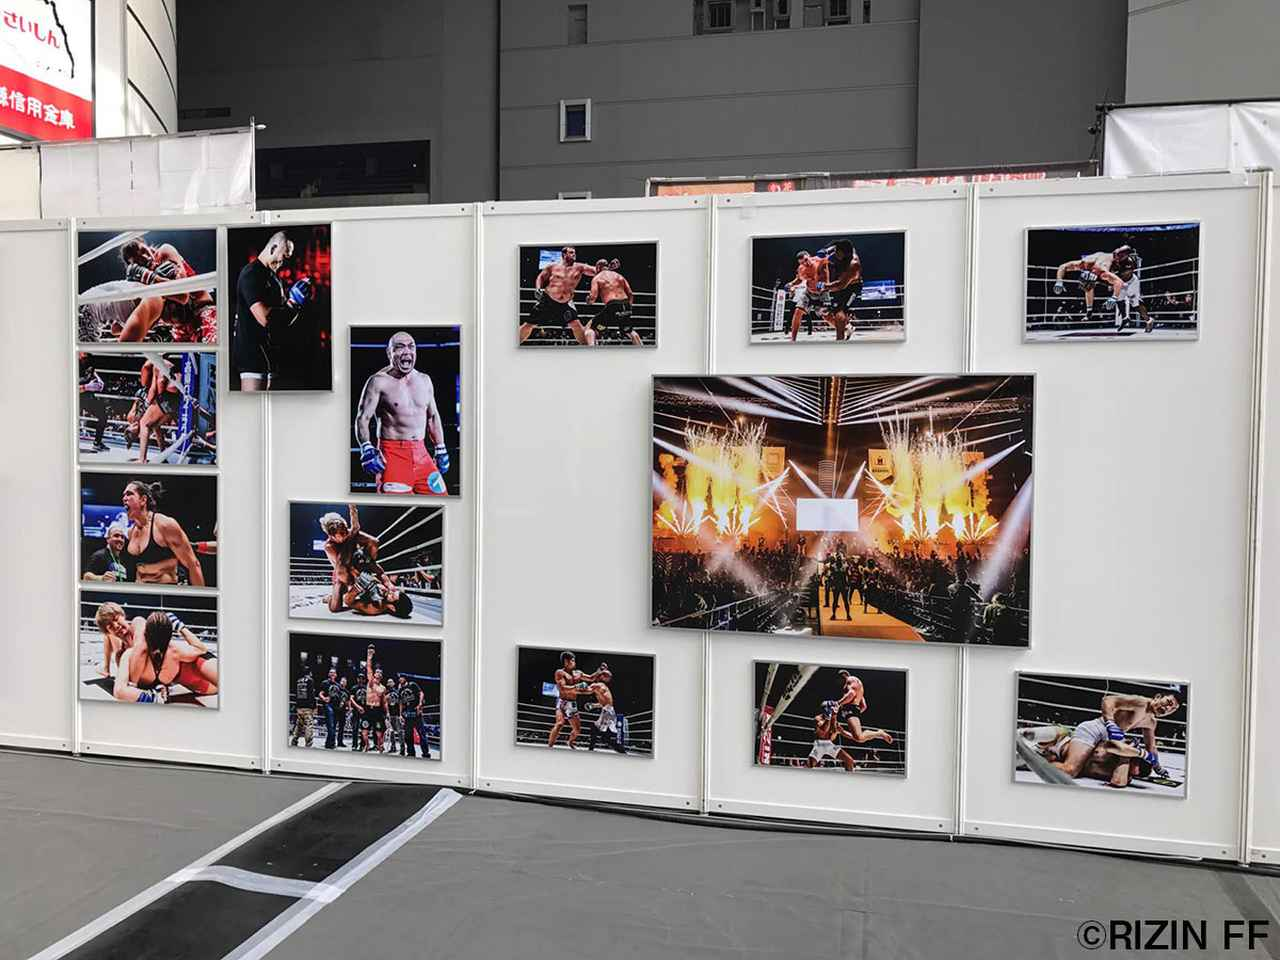 画像6: 今年も大盛況!『格闘技EXPO』